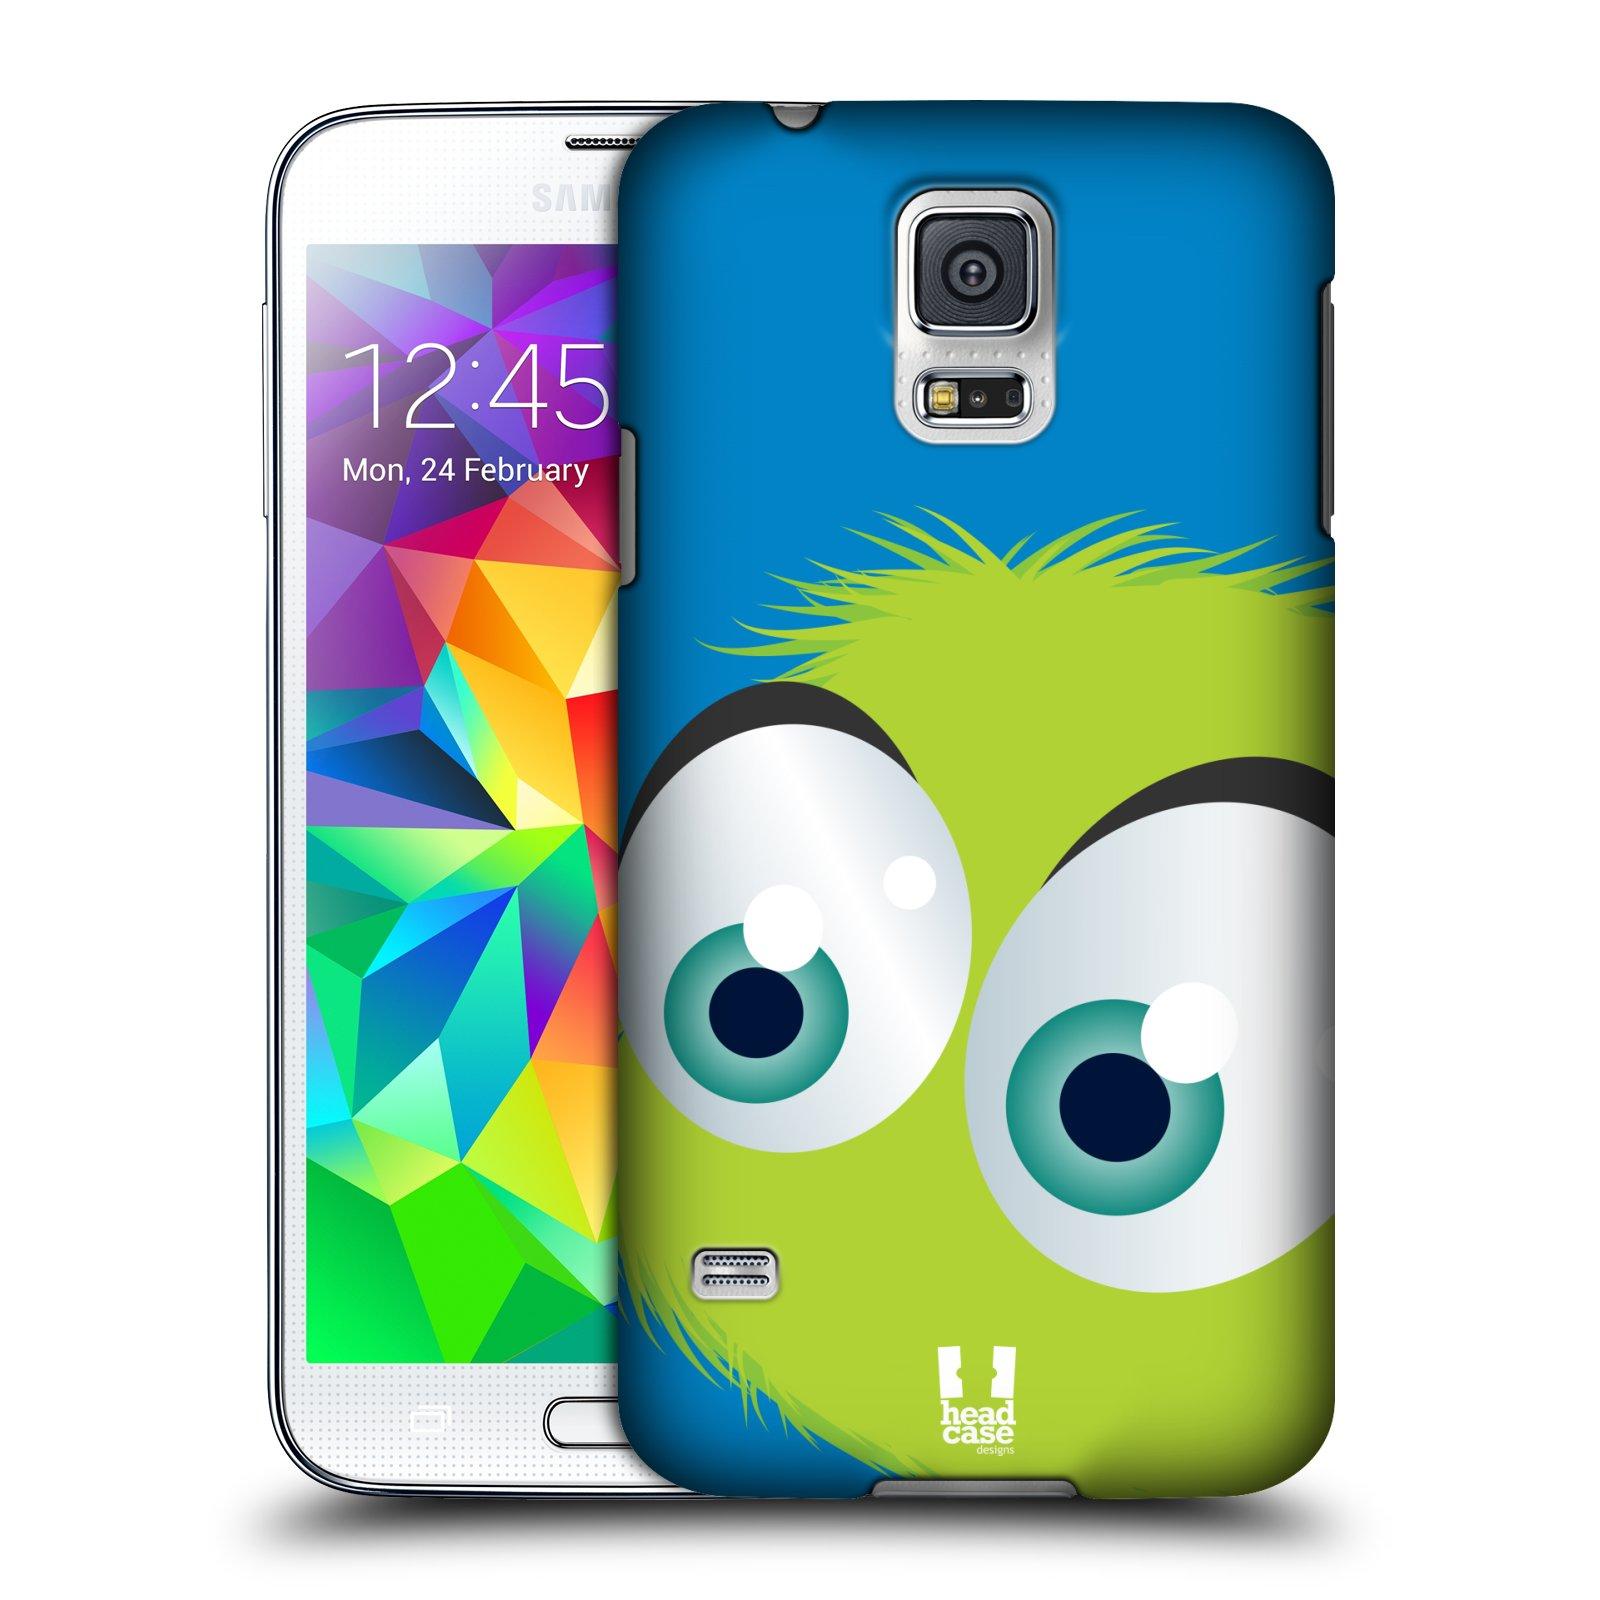 Plastové pouzdro na mobil Samsung Galaxy S5 Neo HEAD CASE FUZÍK ZELENÝ (Kryt či obal na mobilní telefon Samsung Galaxy S5 Neo SM-G903F)